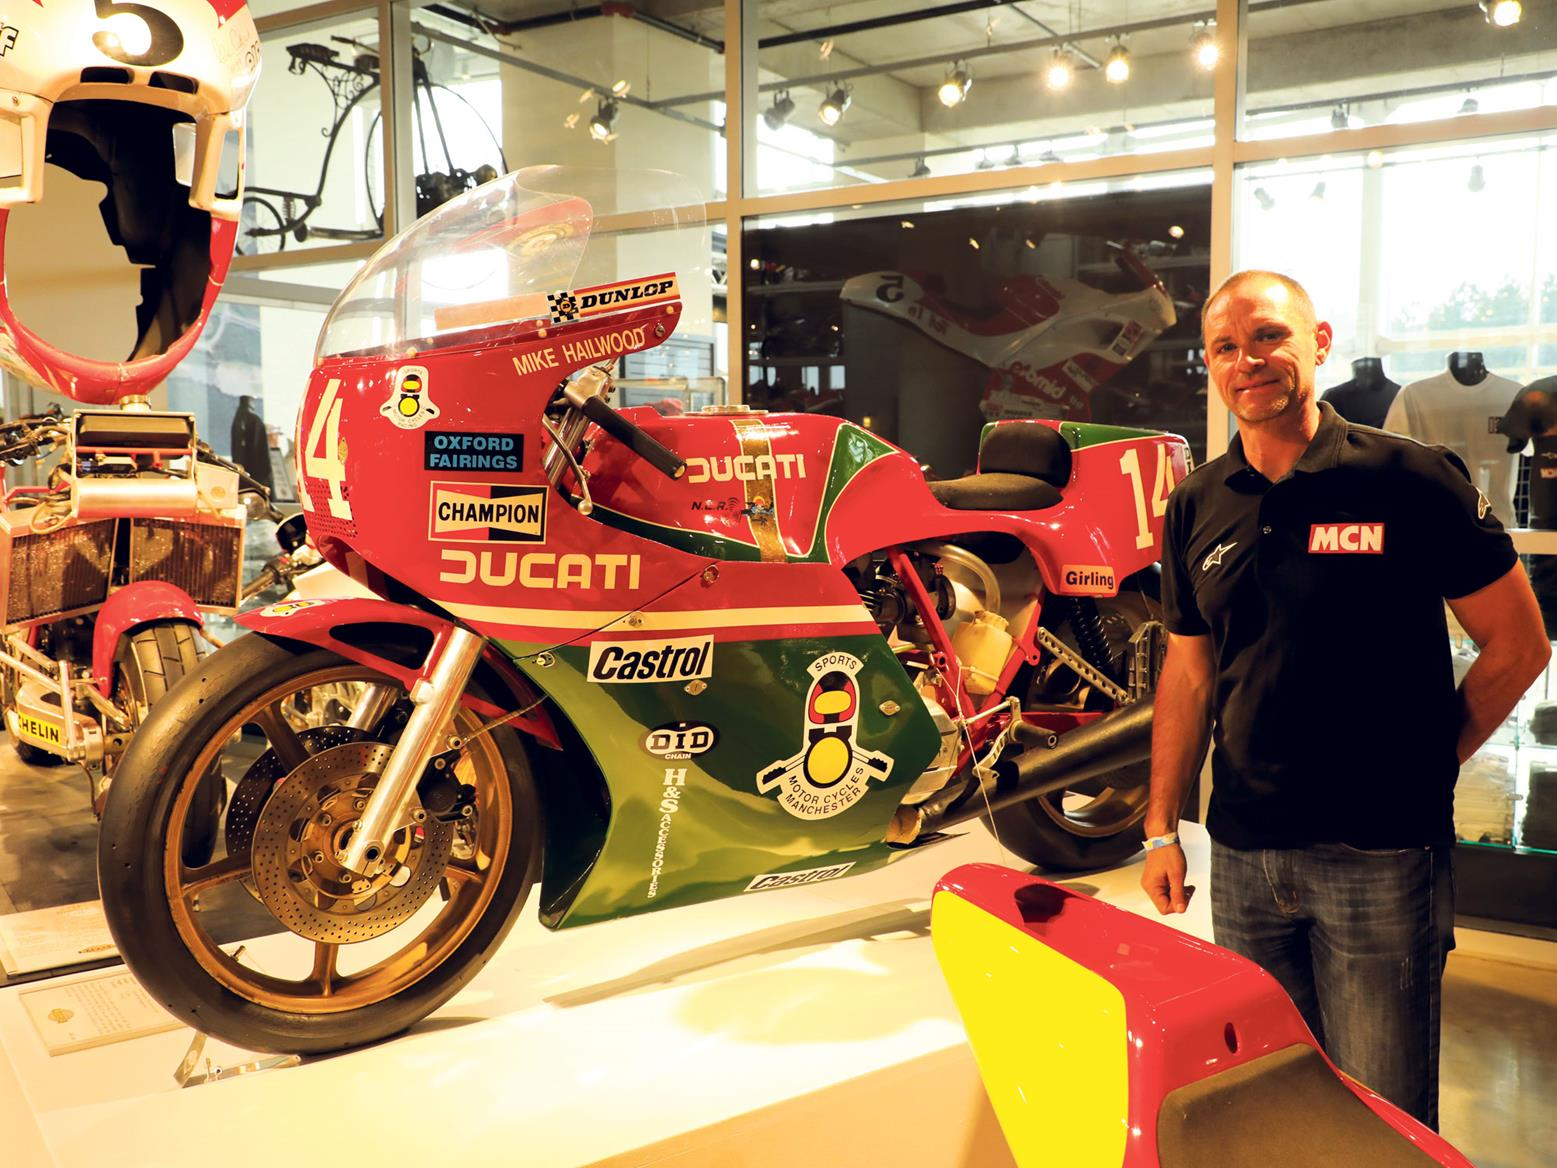 Michael Neeves alongside Mike Hailwood's TT NCR Ducati